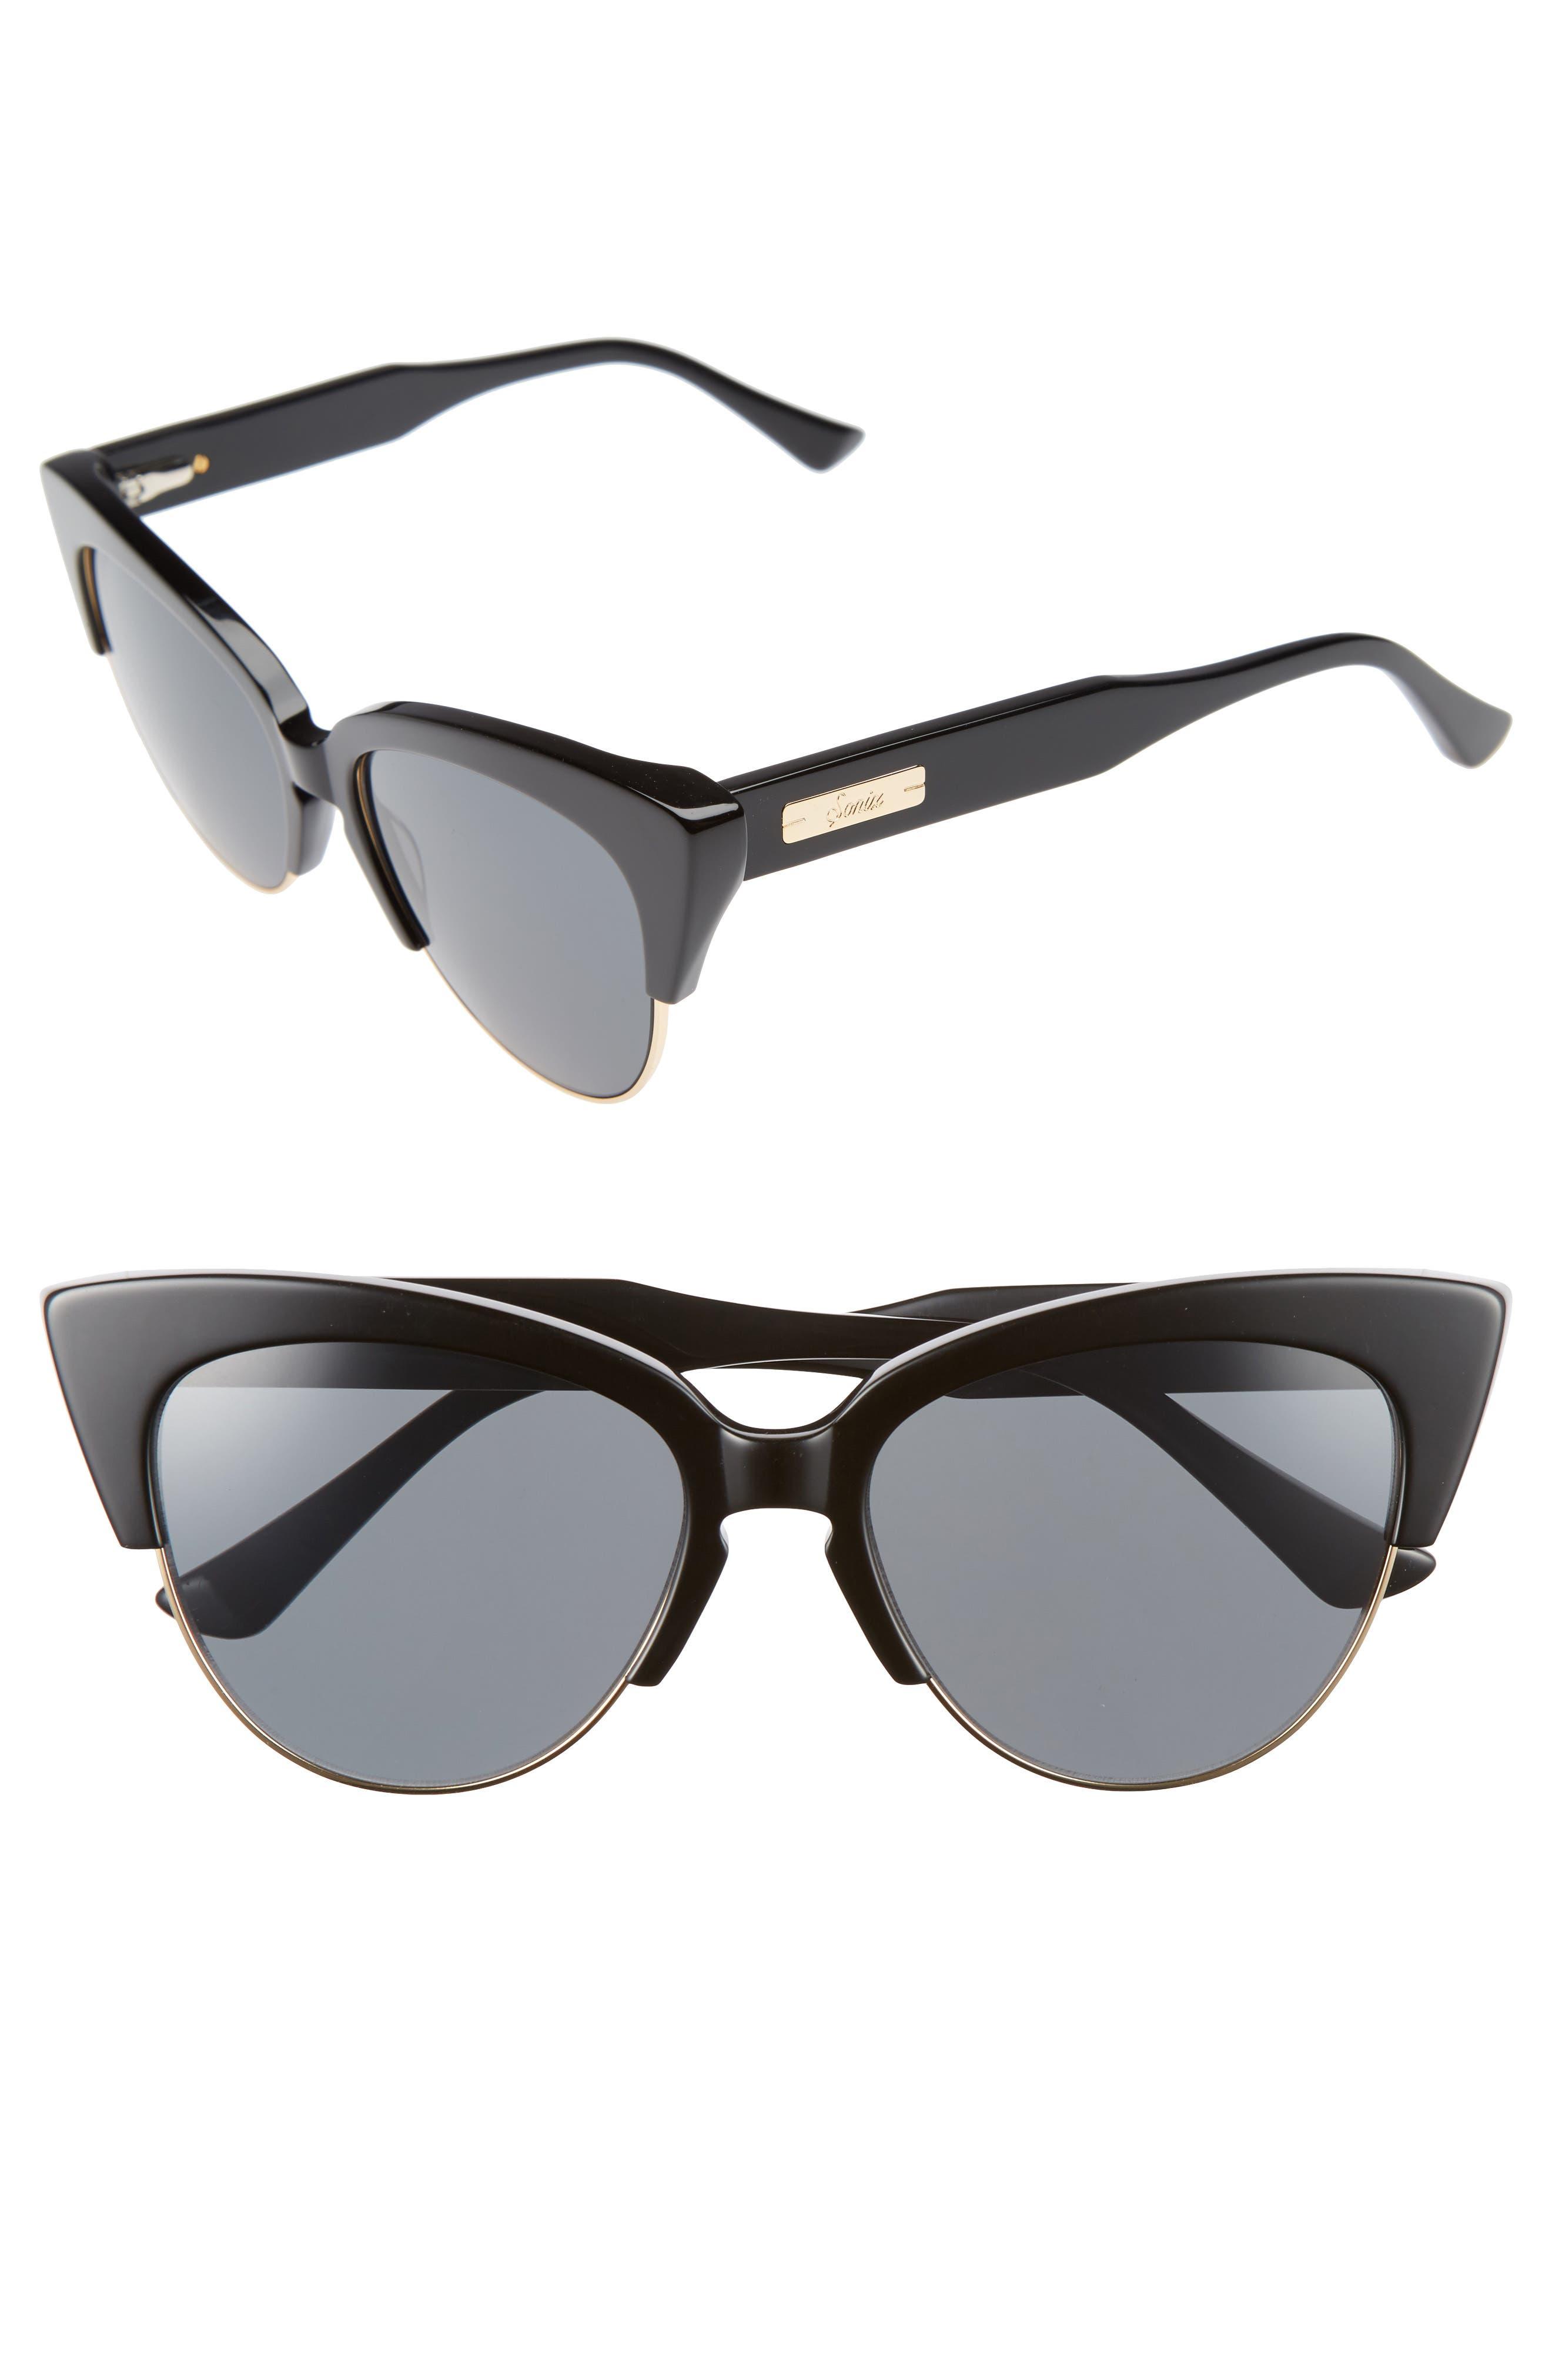 SONIX Dafni 56mm Gradient Cat Eye Sunglasses, Main, color, 001